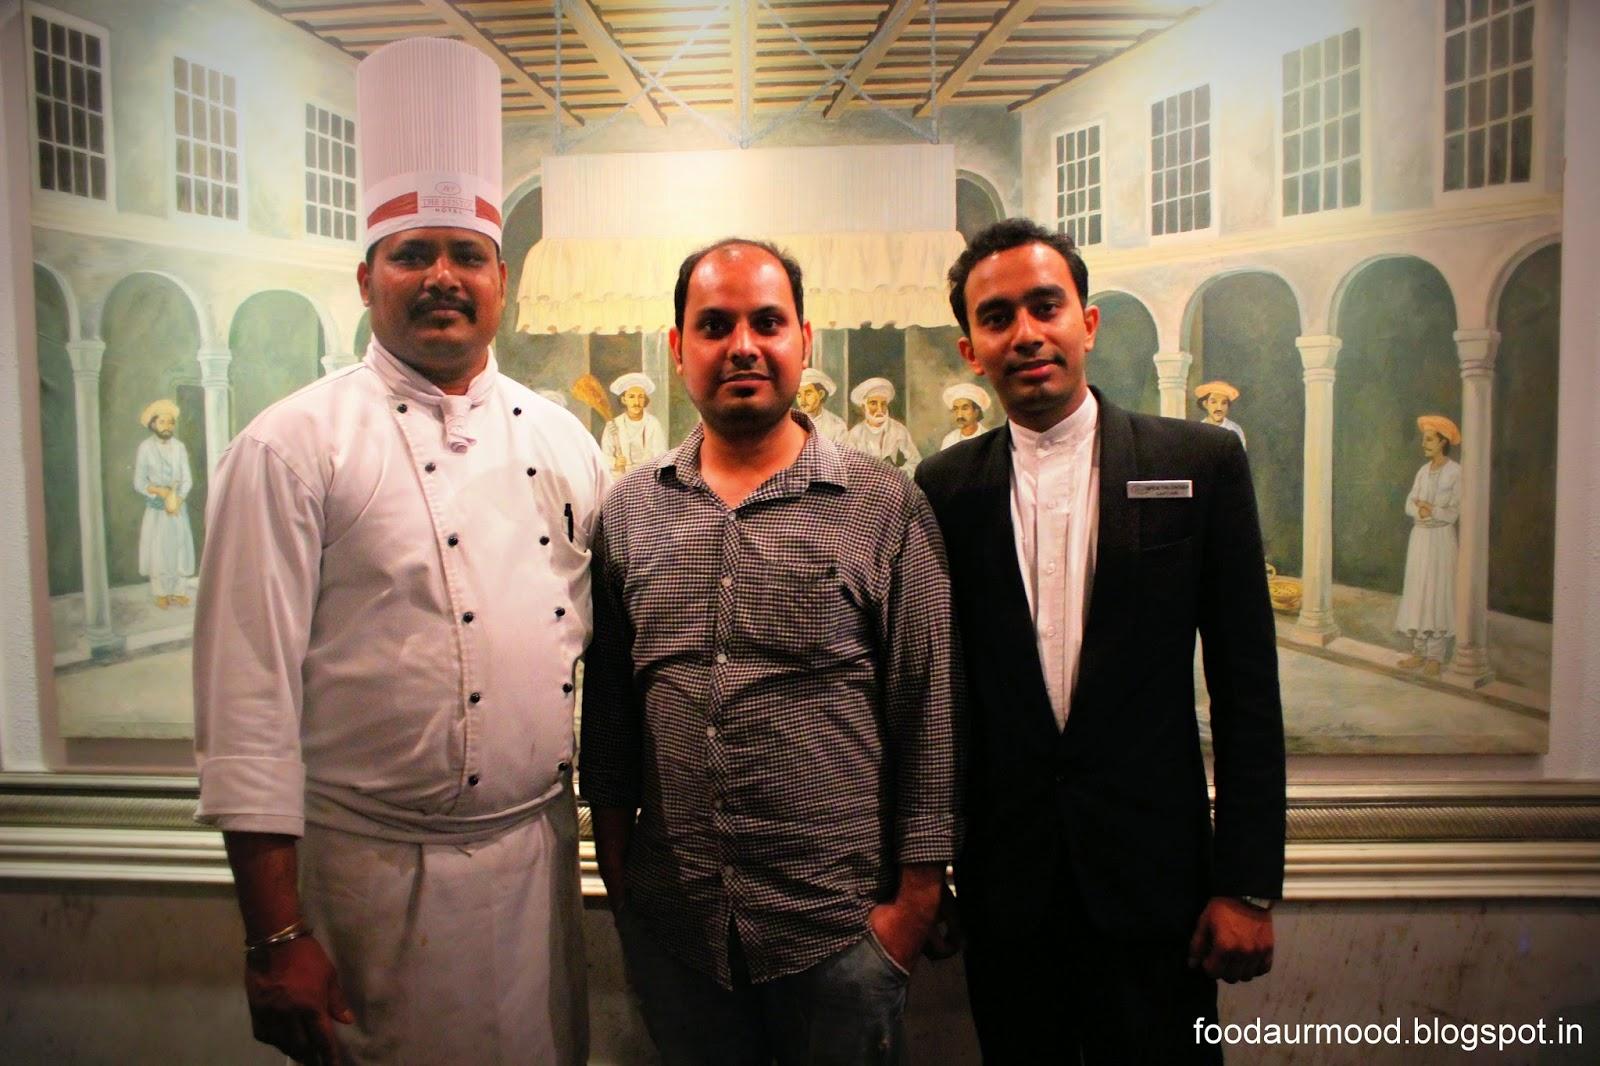 Chef Amia Das, foodaurmood varun saklani The Luscious Mughlai,Lucknowi food @ zaffran The Bristol Hotel, Gurgaon